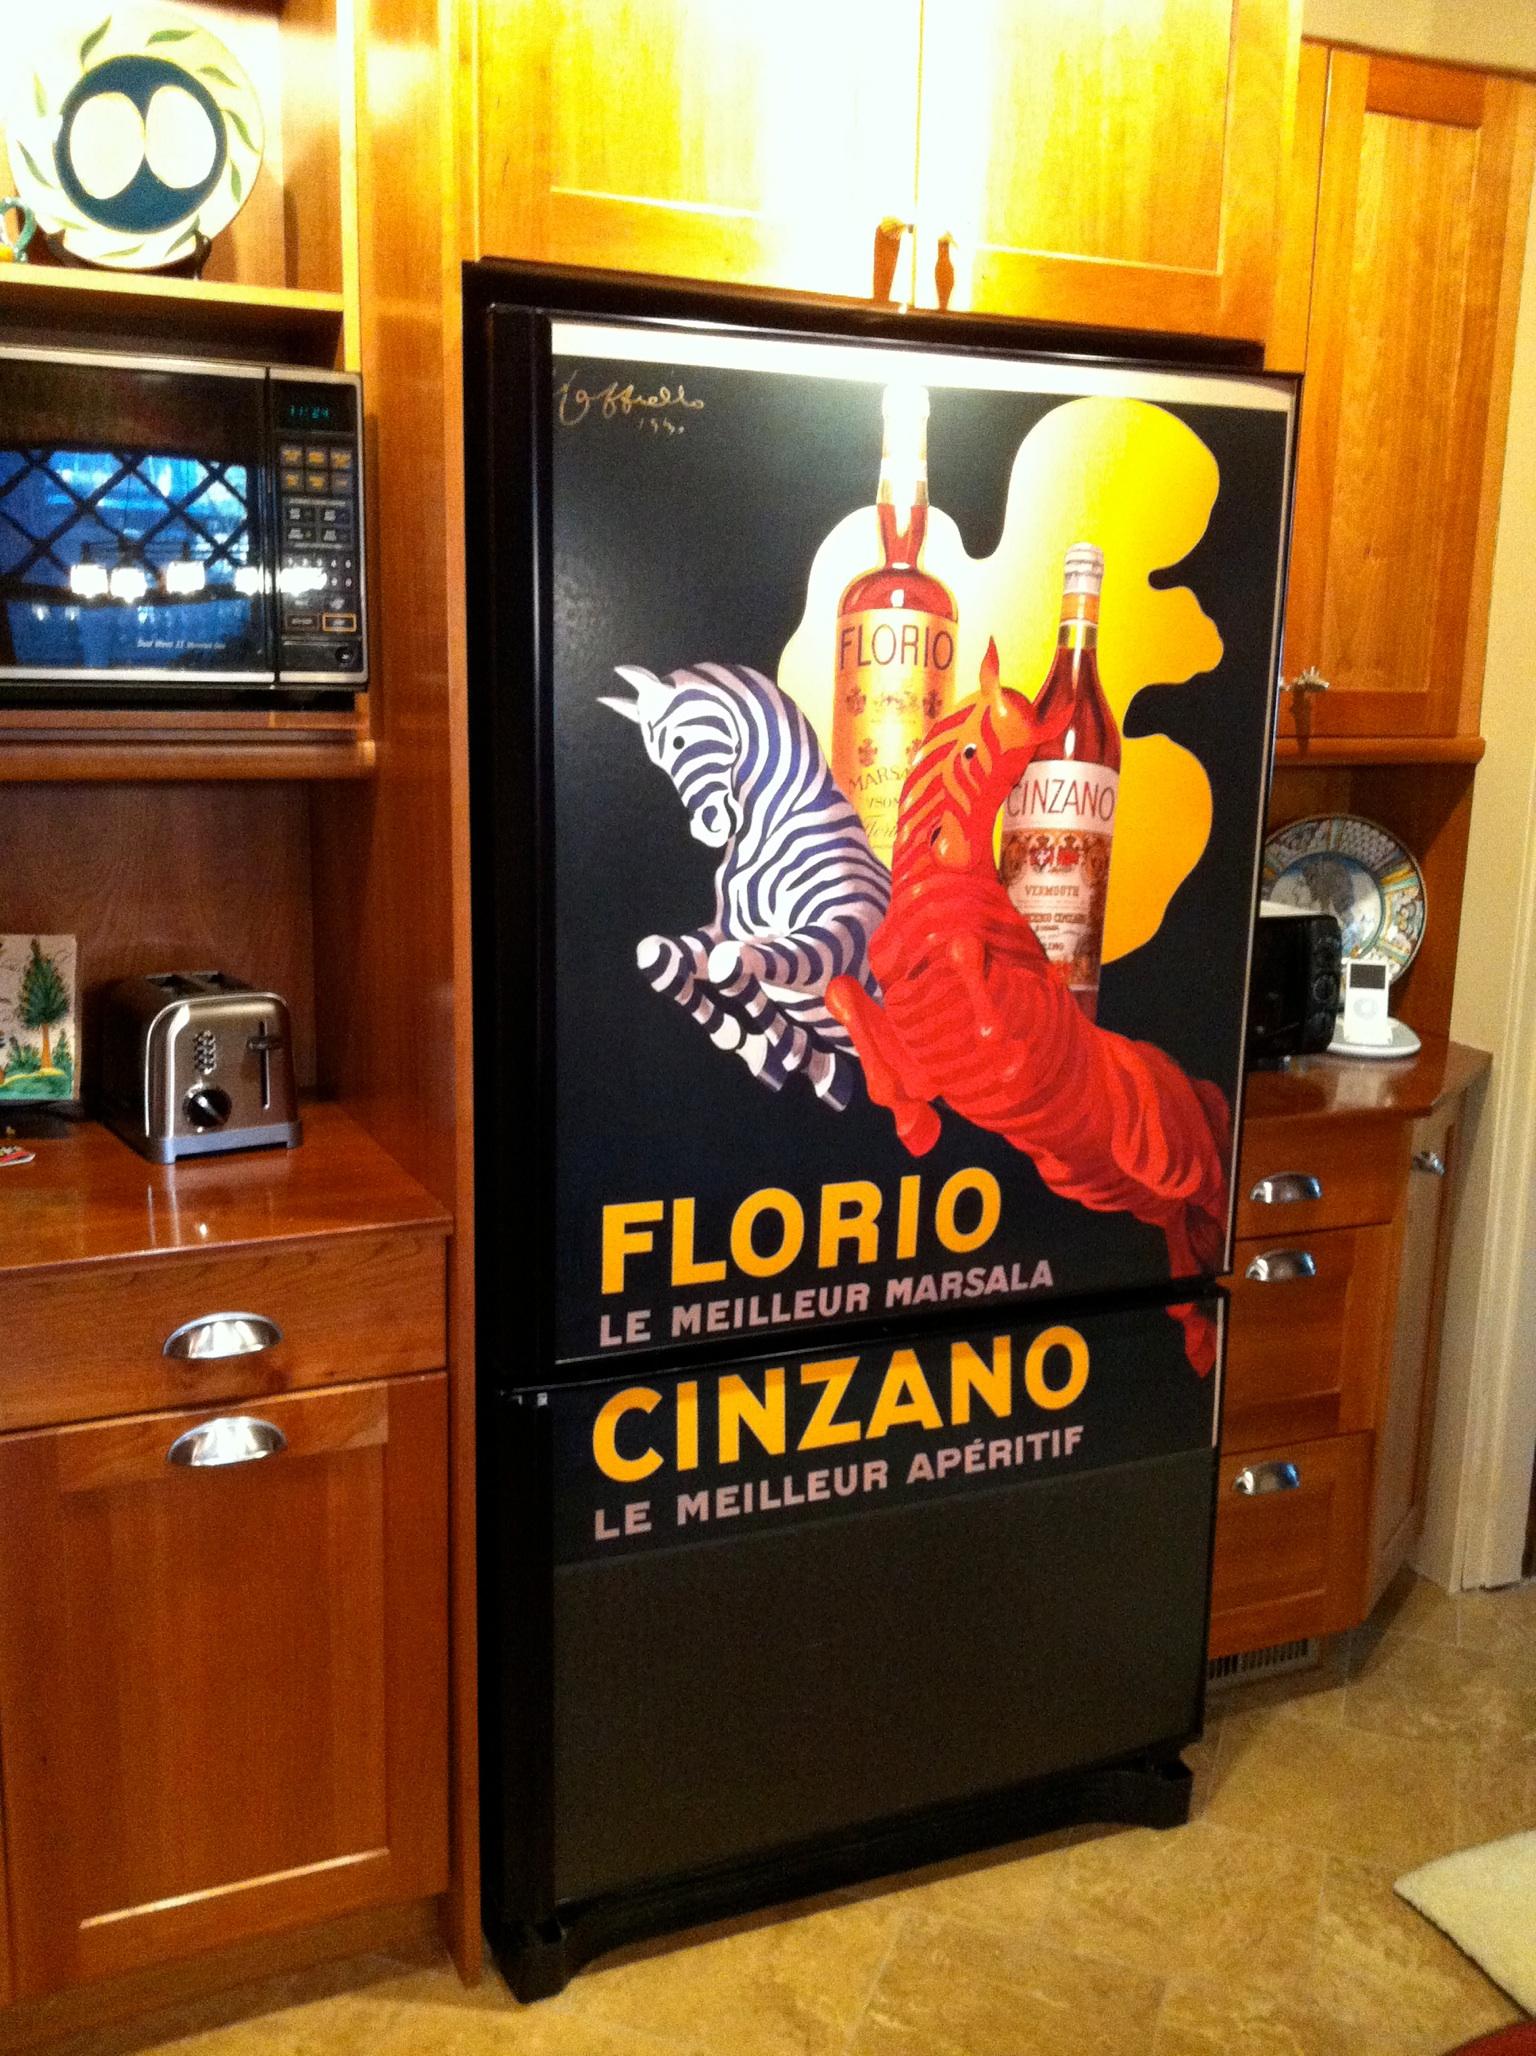 The first fridge